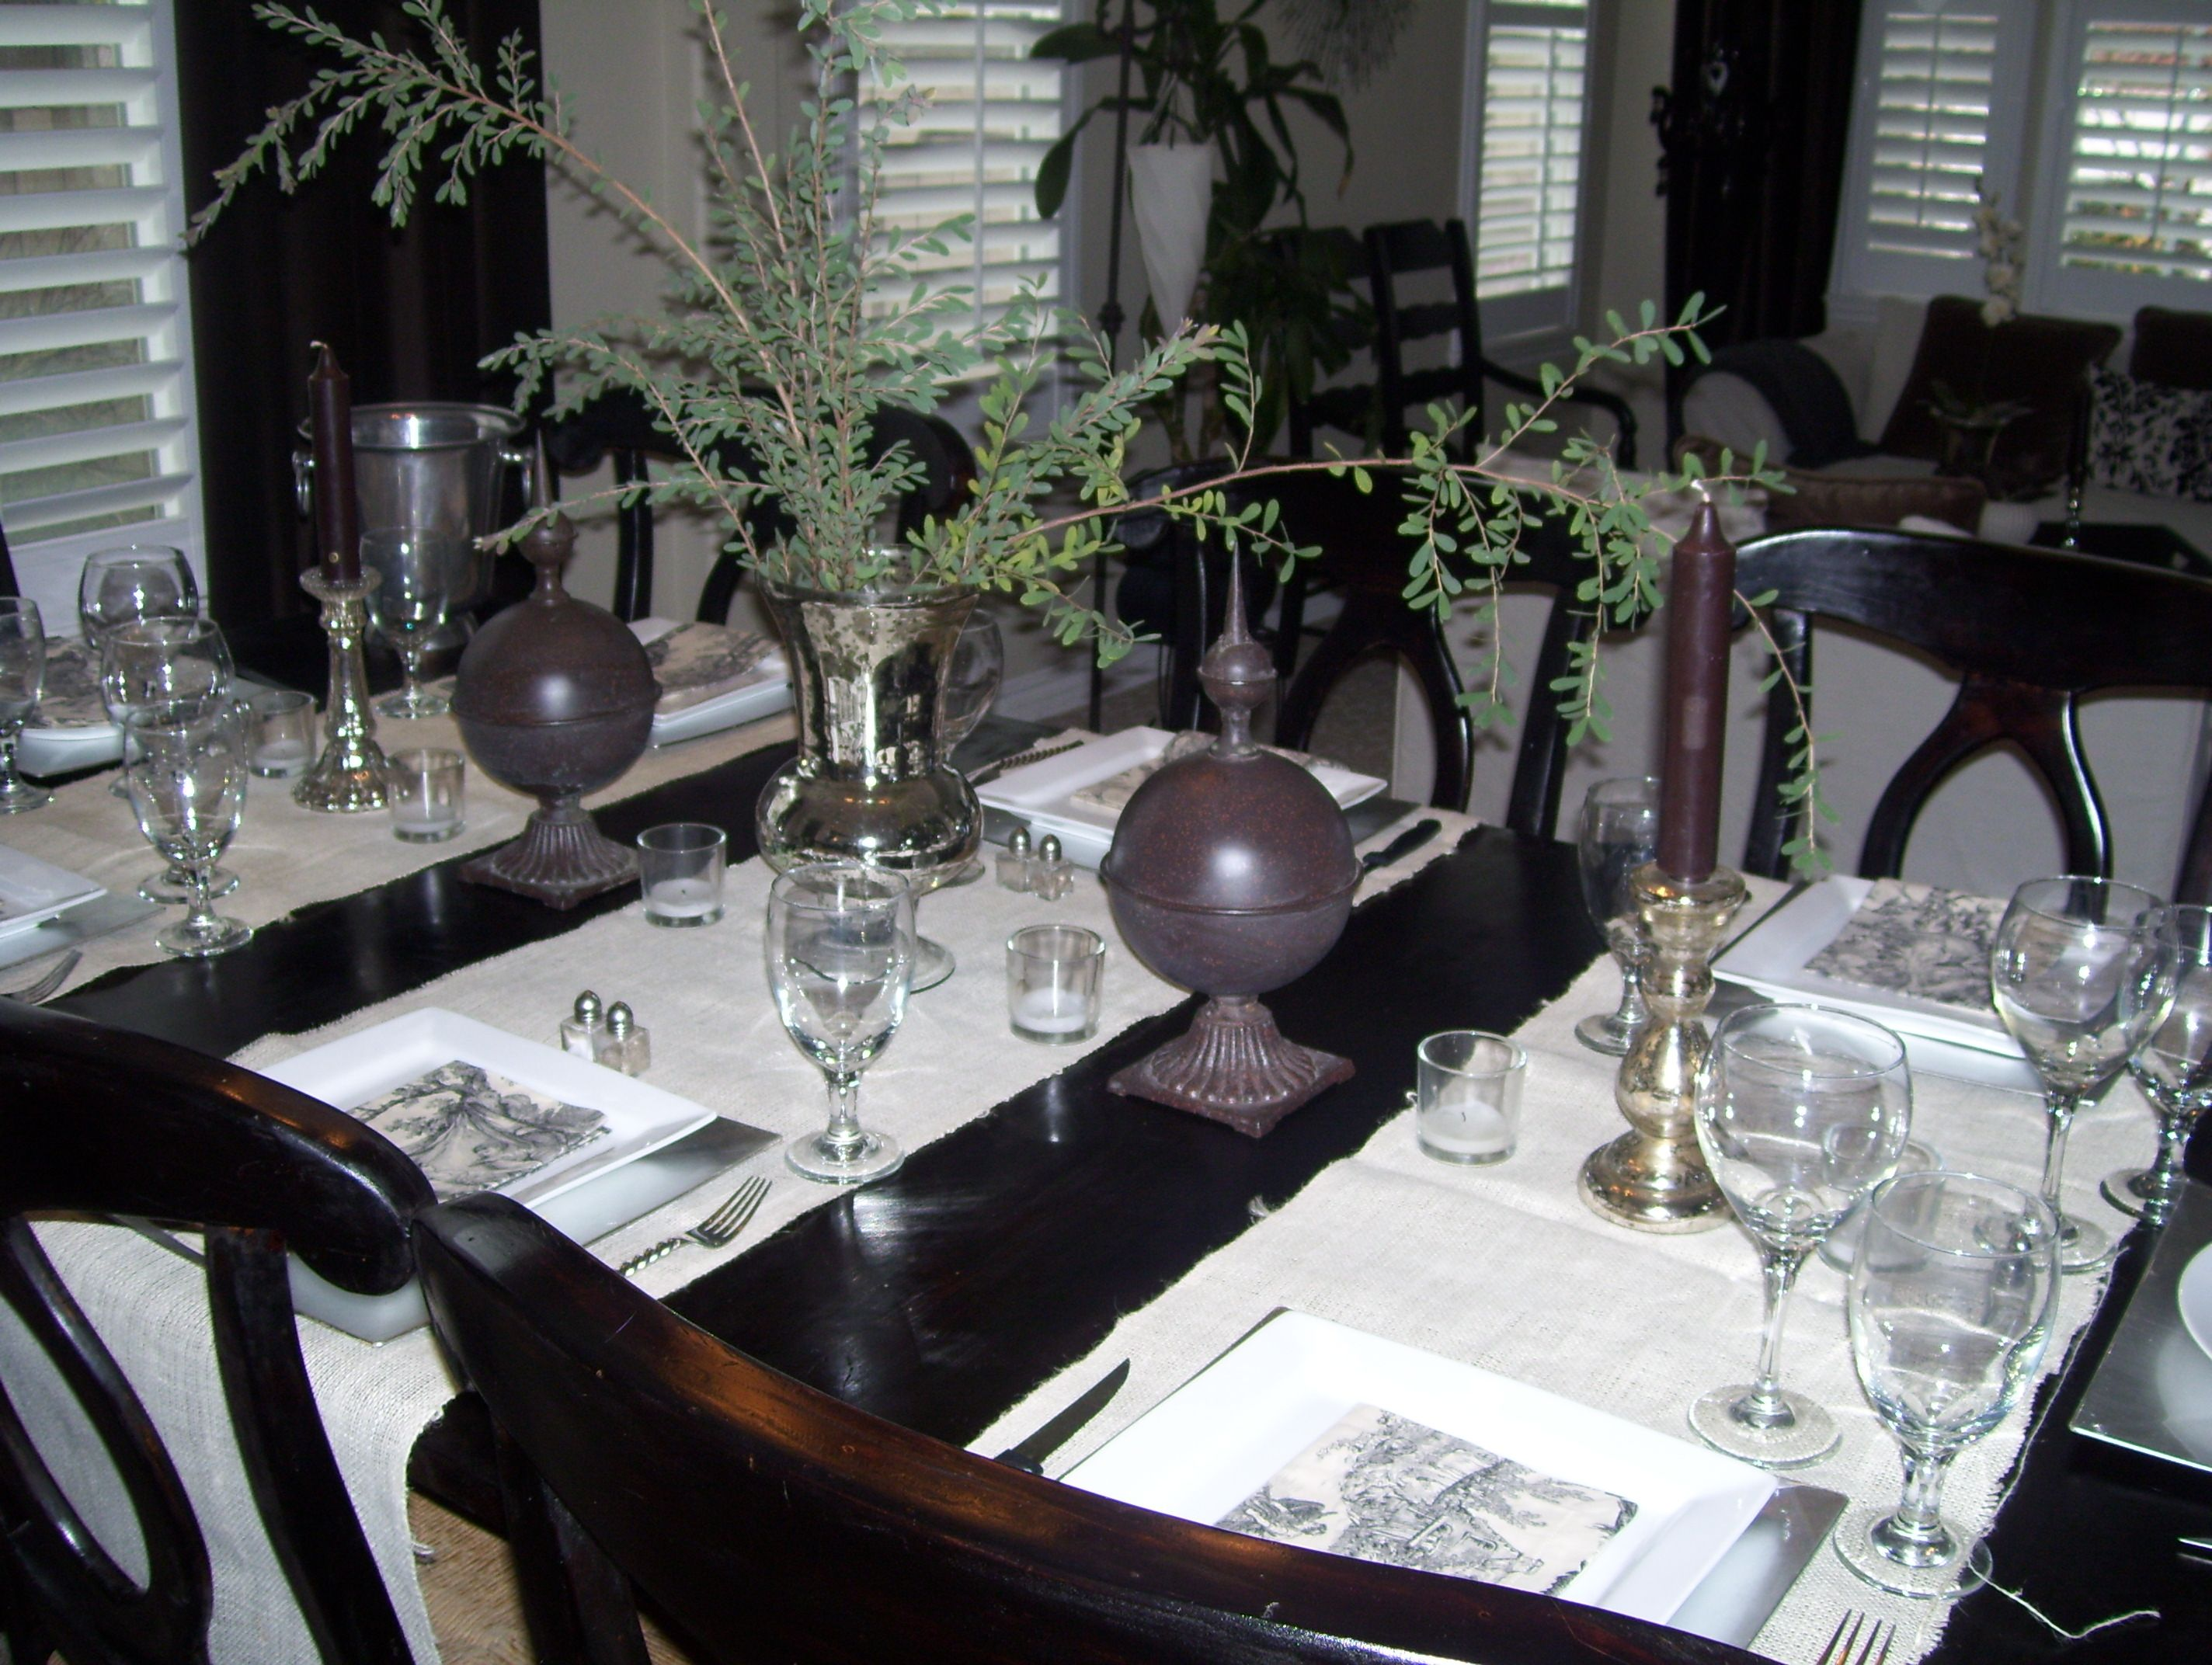 finials, mercury glass, sprigs